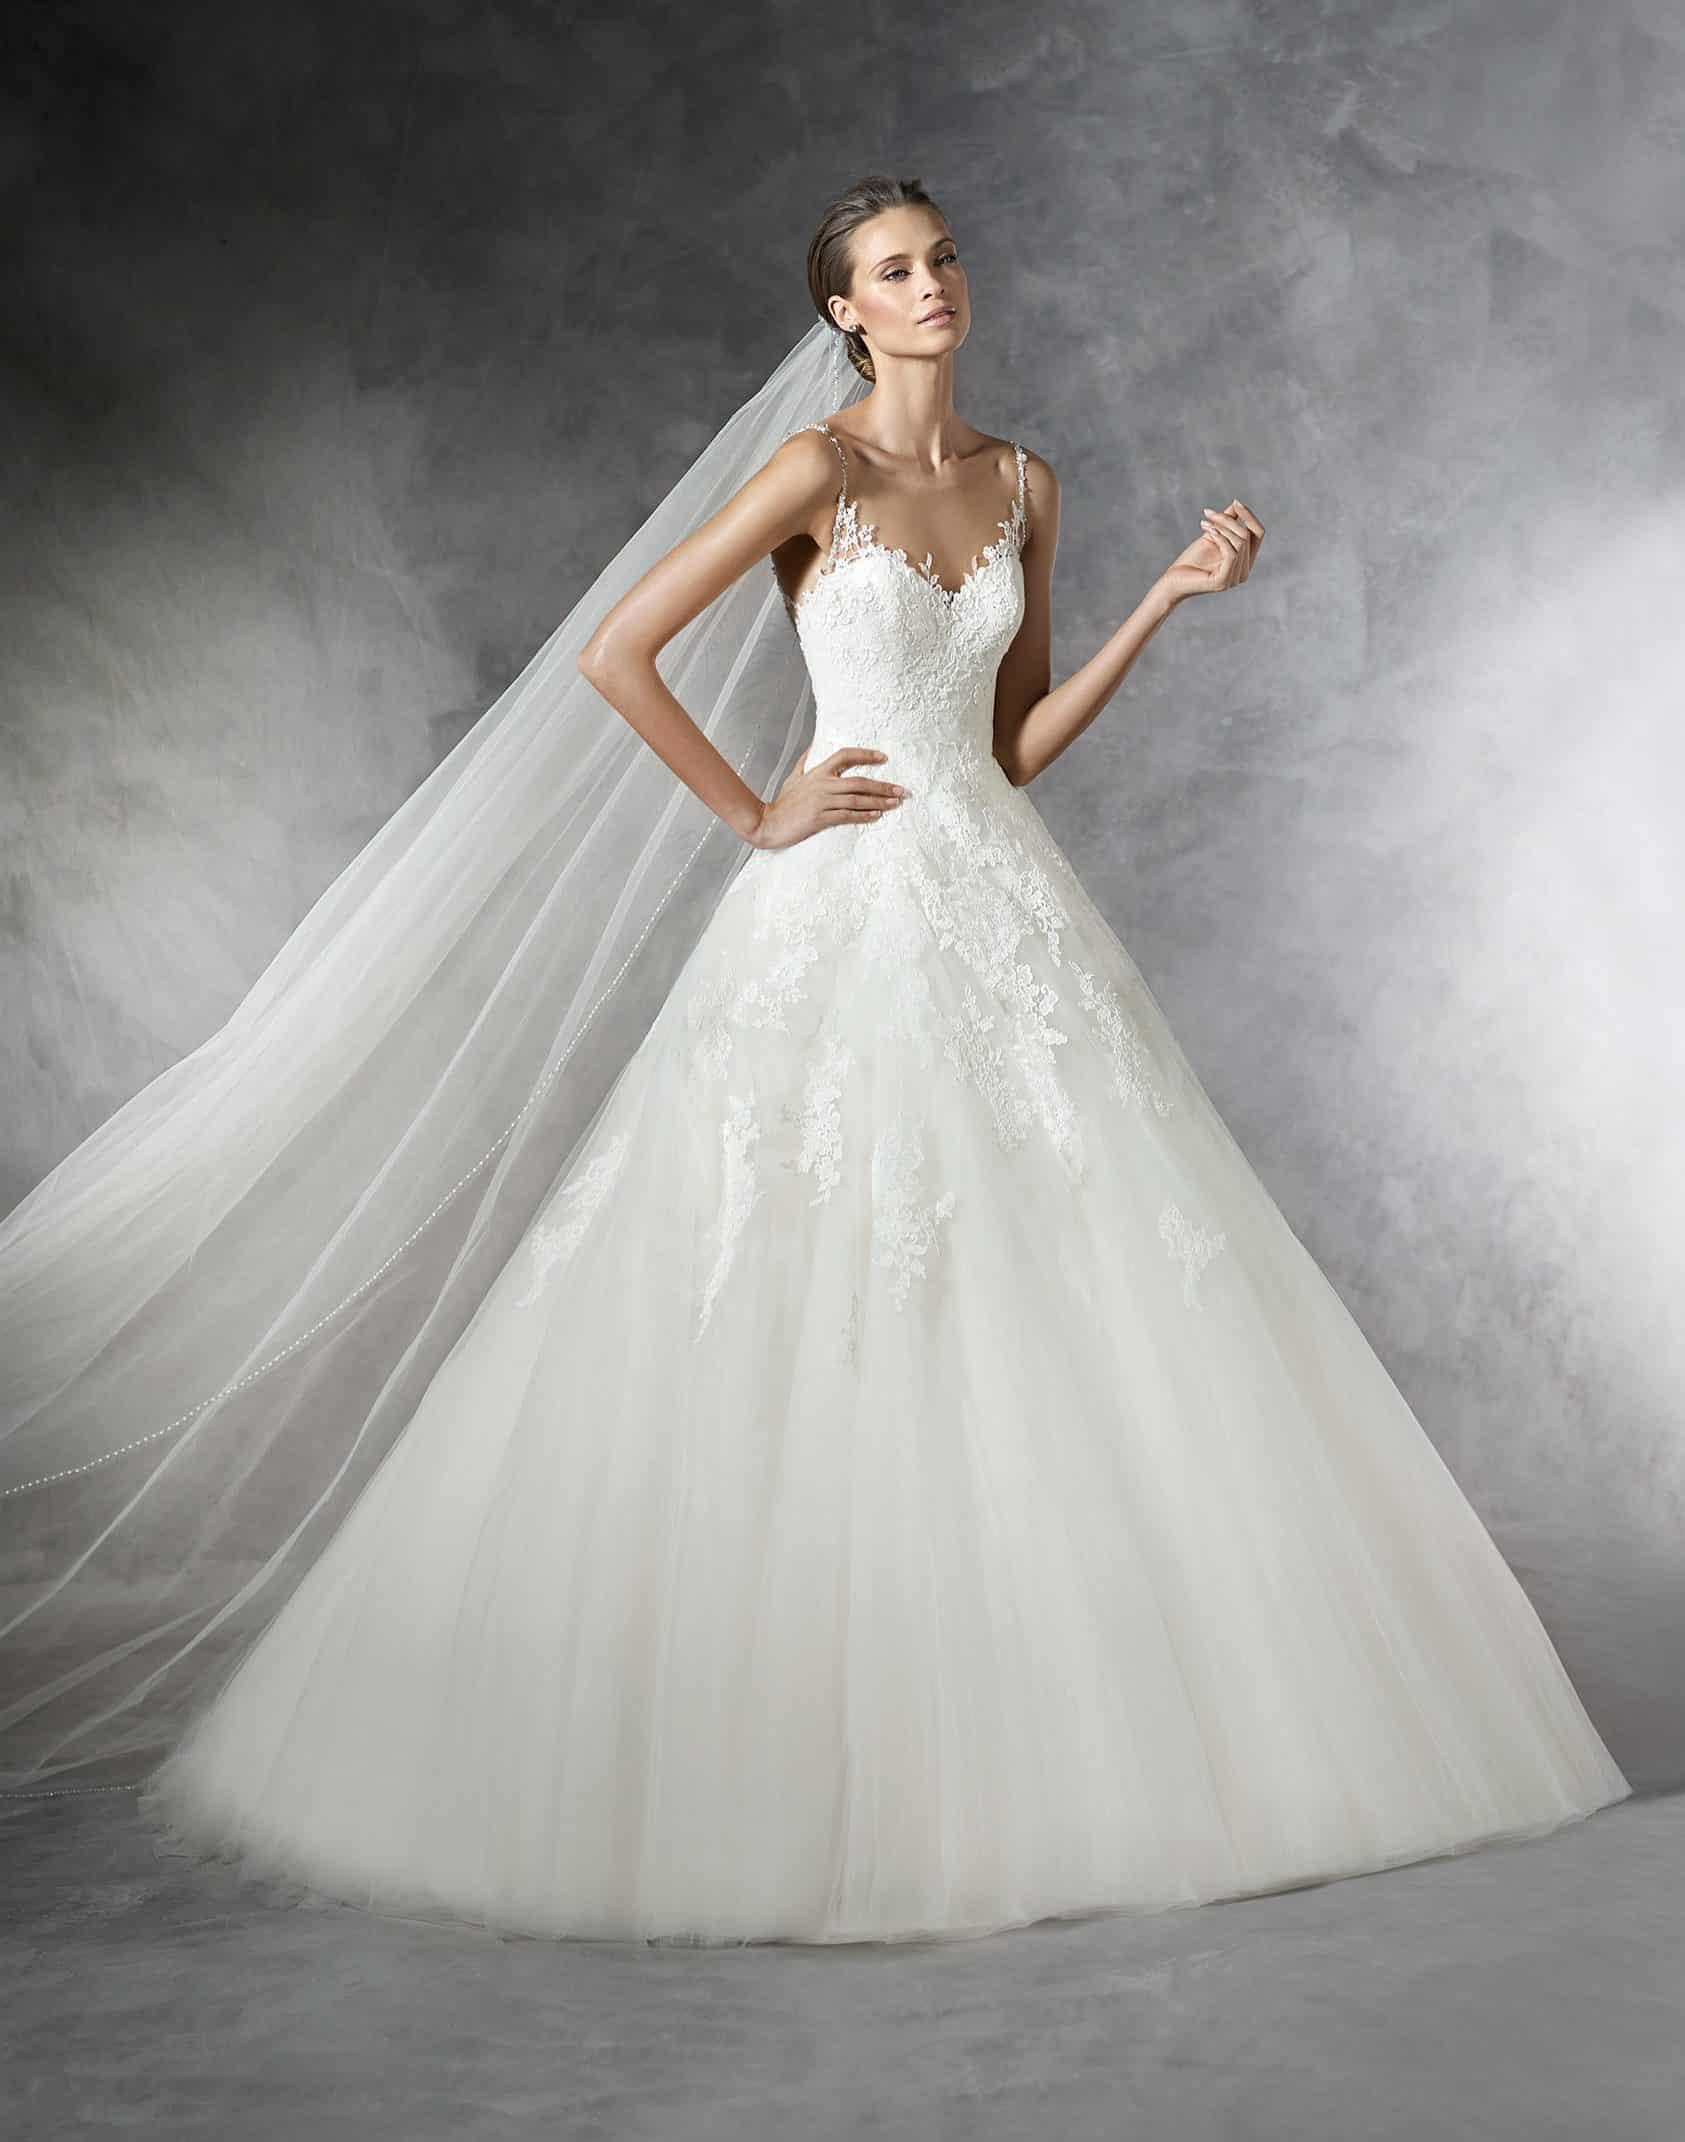 Types of Wedding Dresses 1